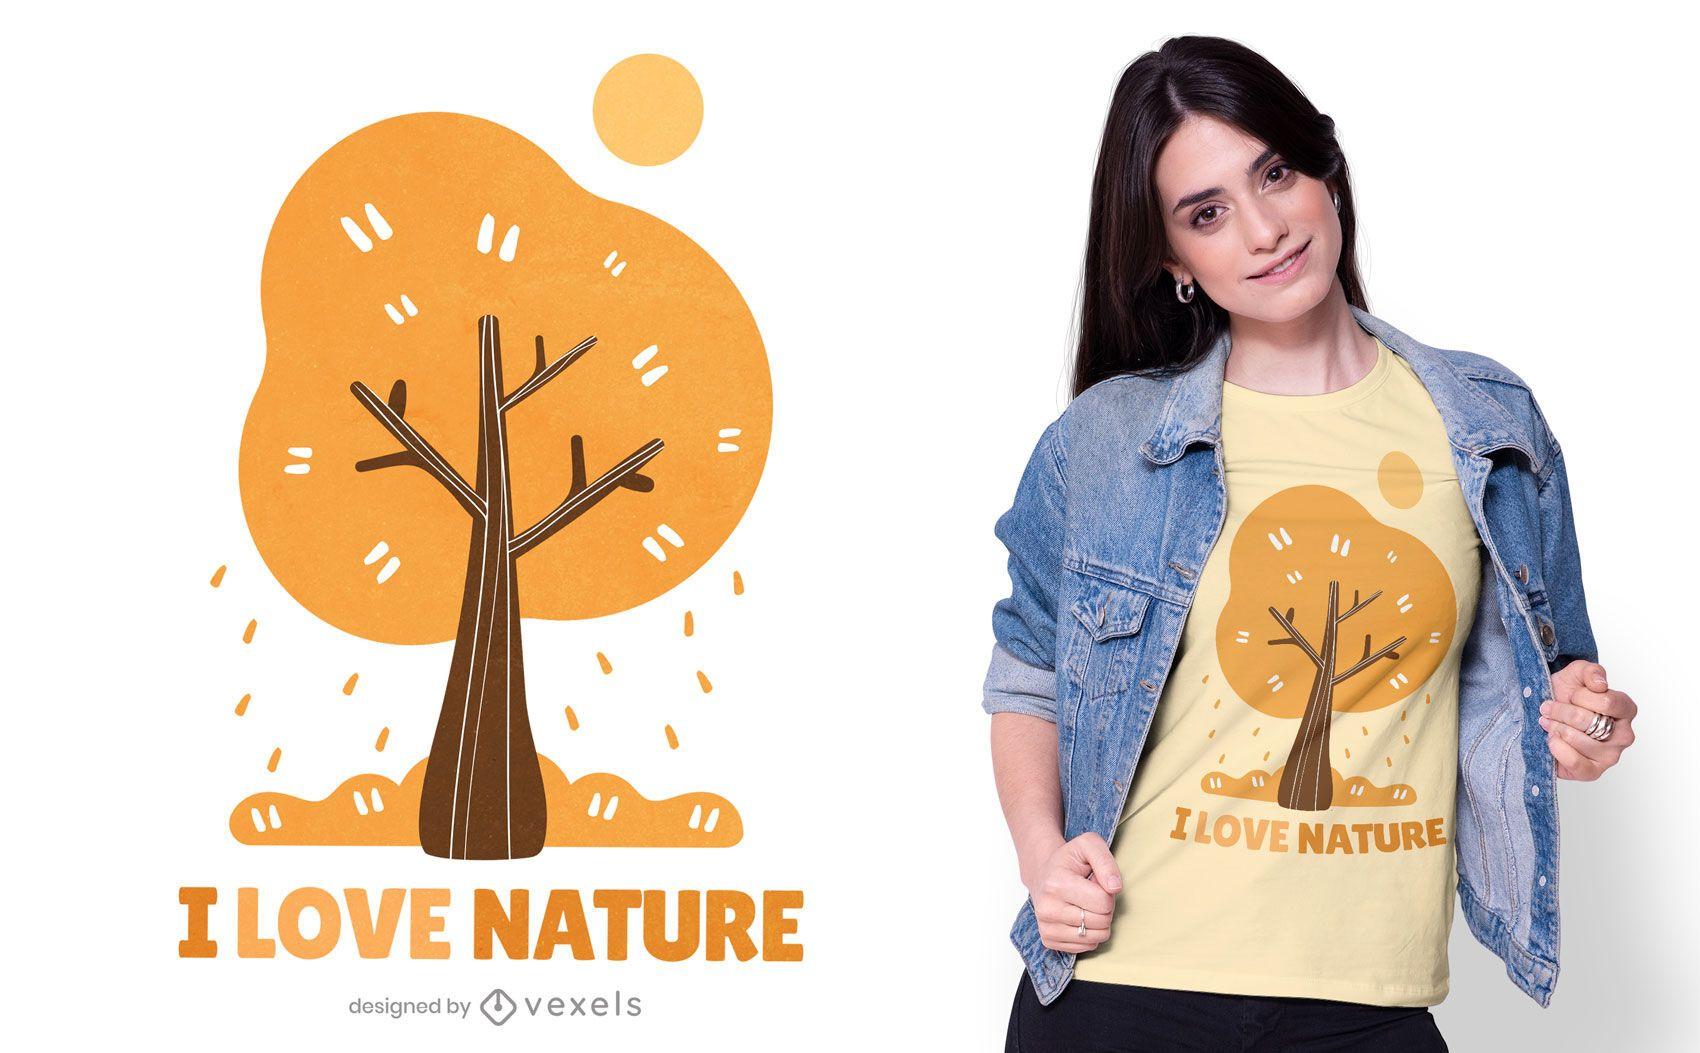 I love nature t-shirt design